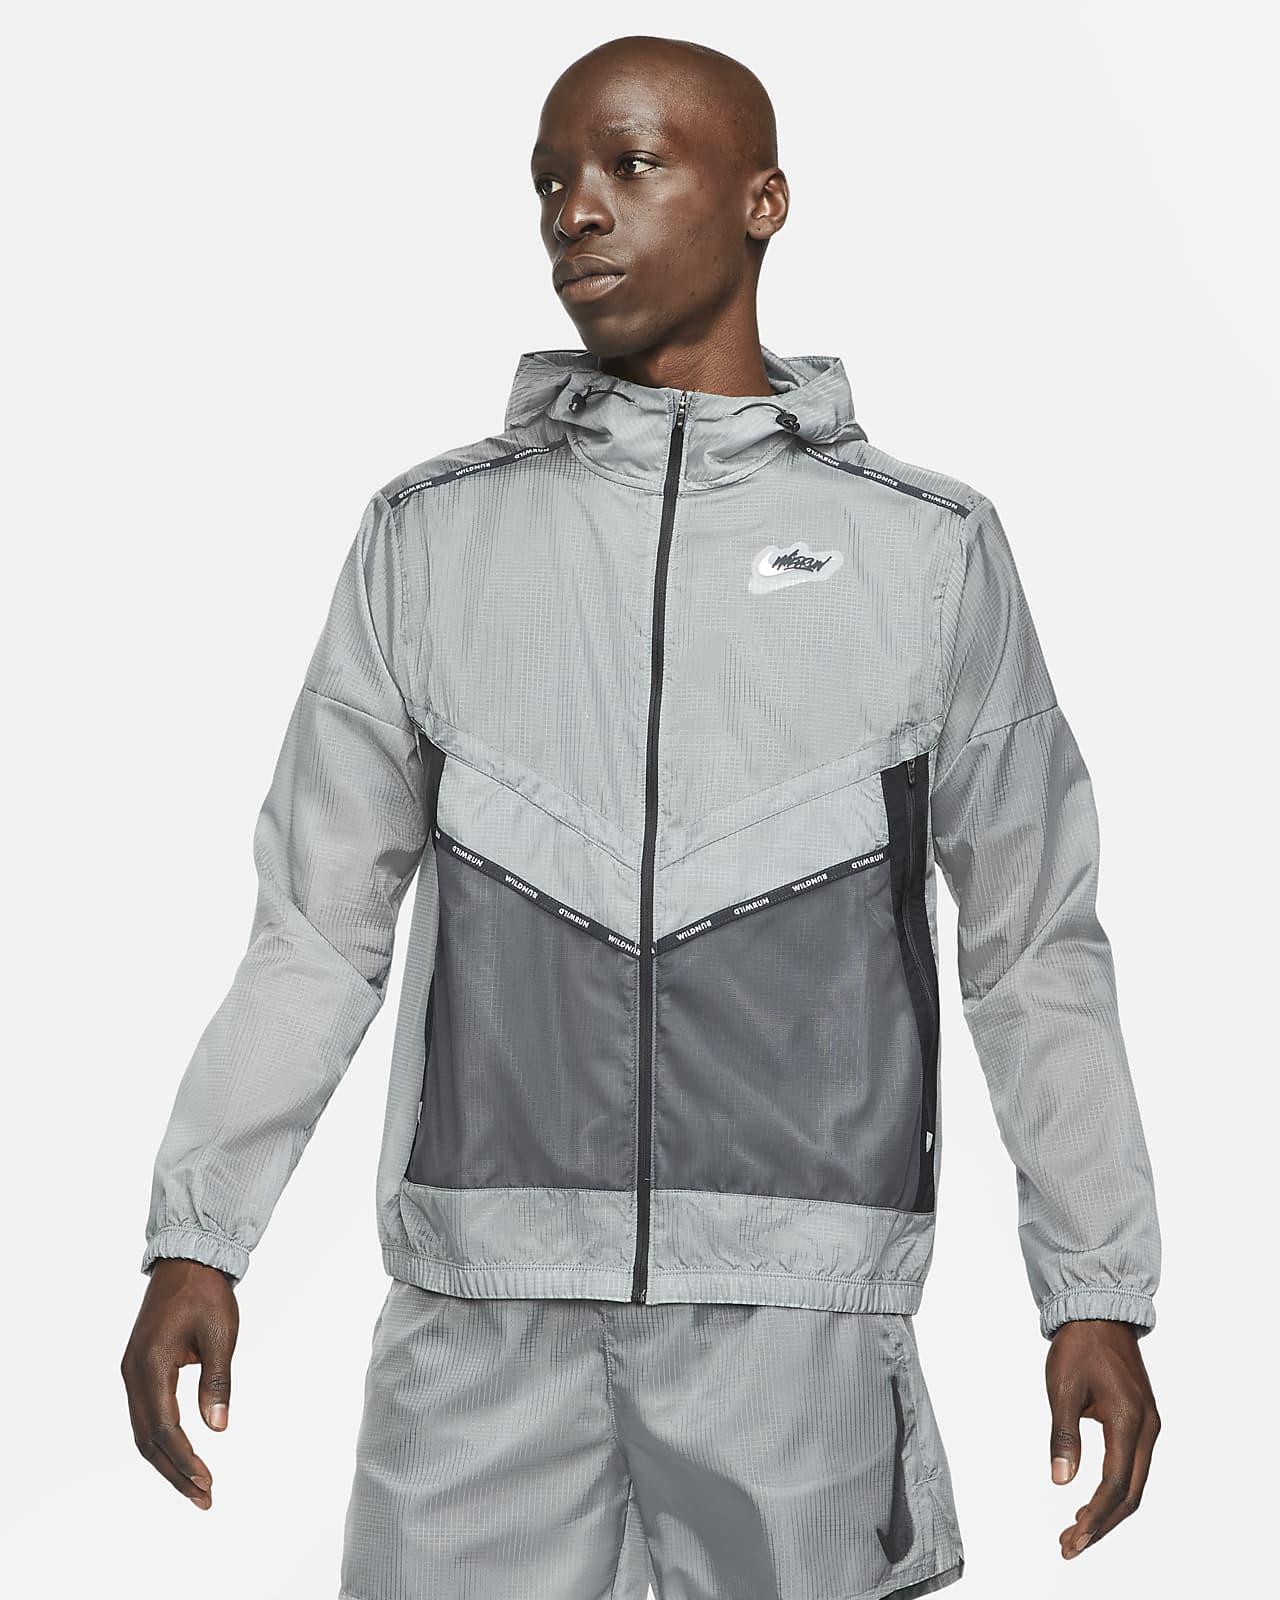 Veste de running à motifs Nike Repel Wild Run Windrunner pour Homme